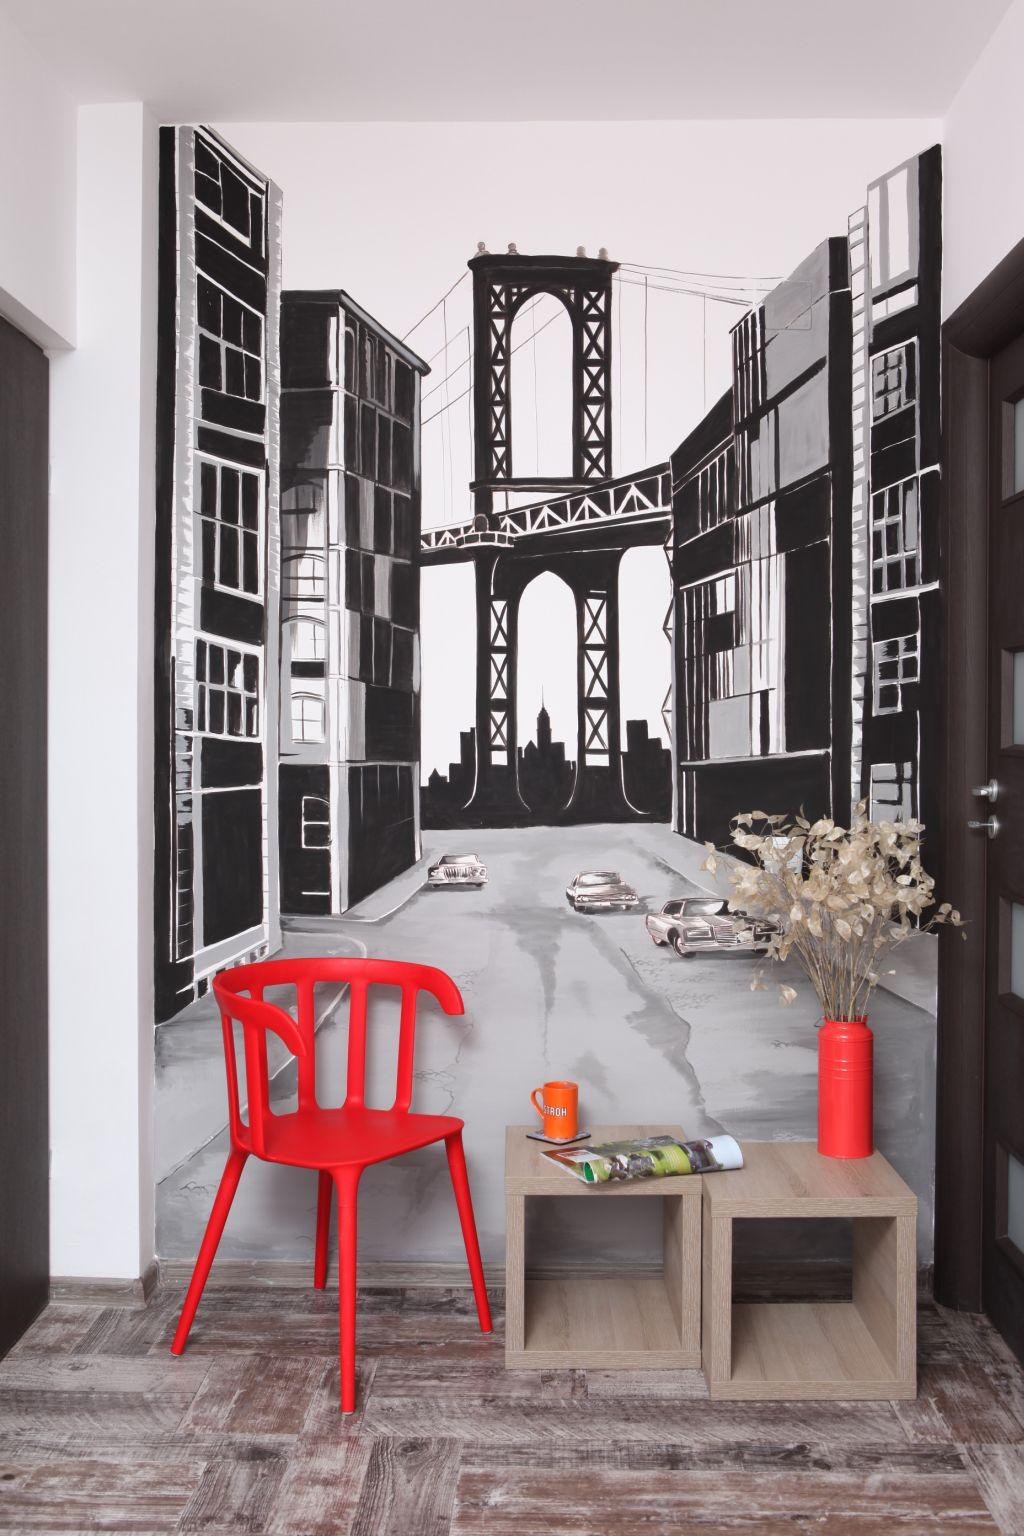 adelaparvu.com despre locuinta in stil urban designer Simona Bonea (6)